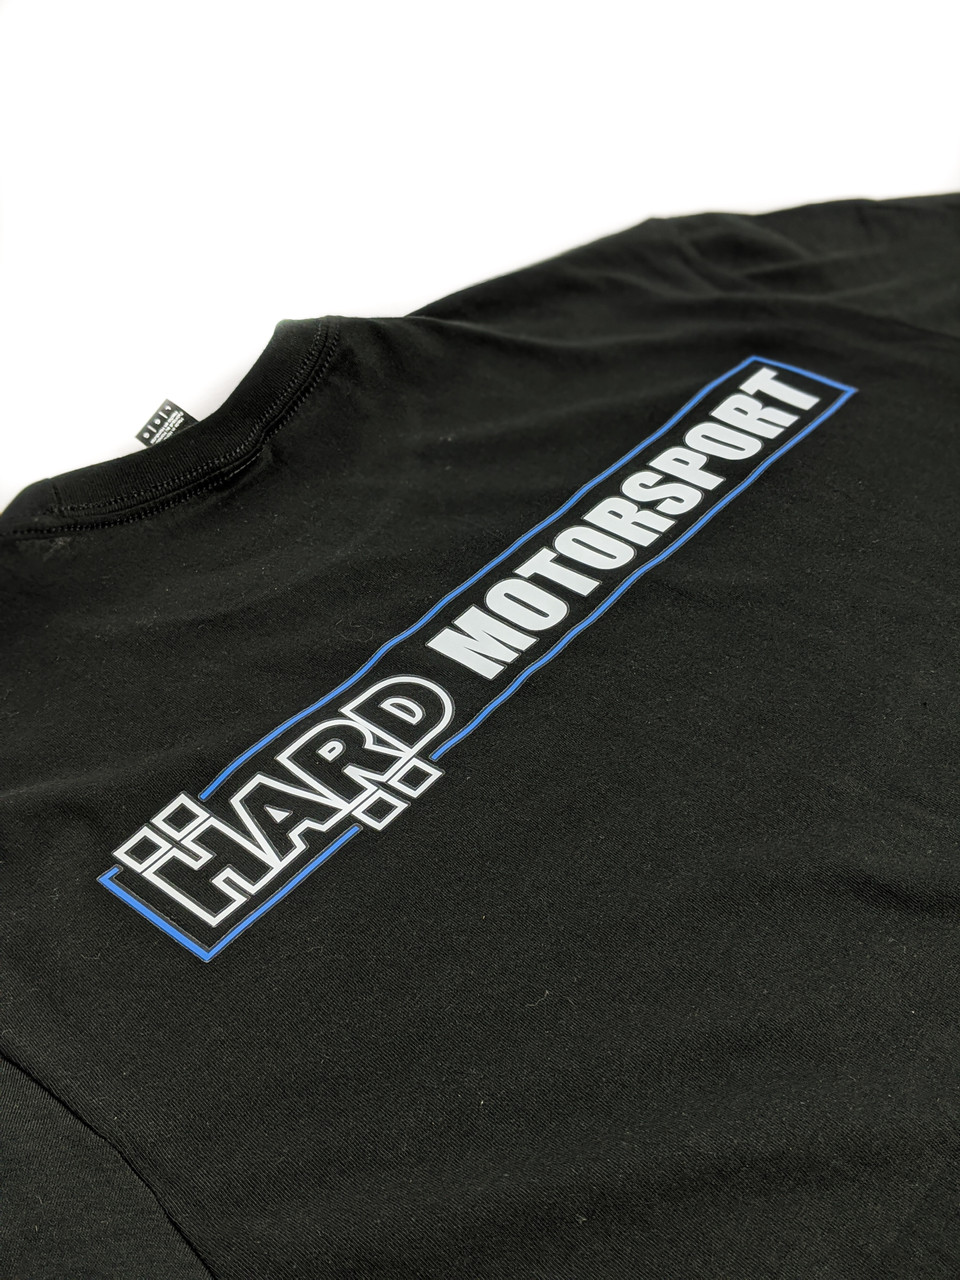 HARD Motorsport Racing Paddock T-Shirt